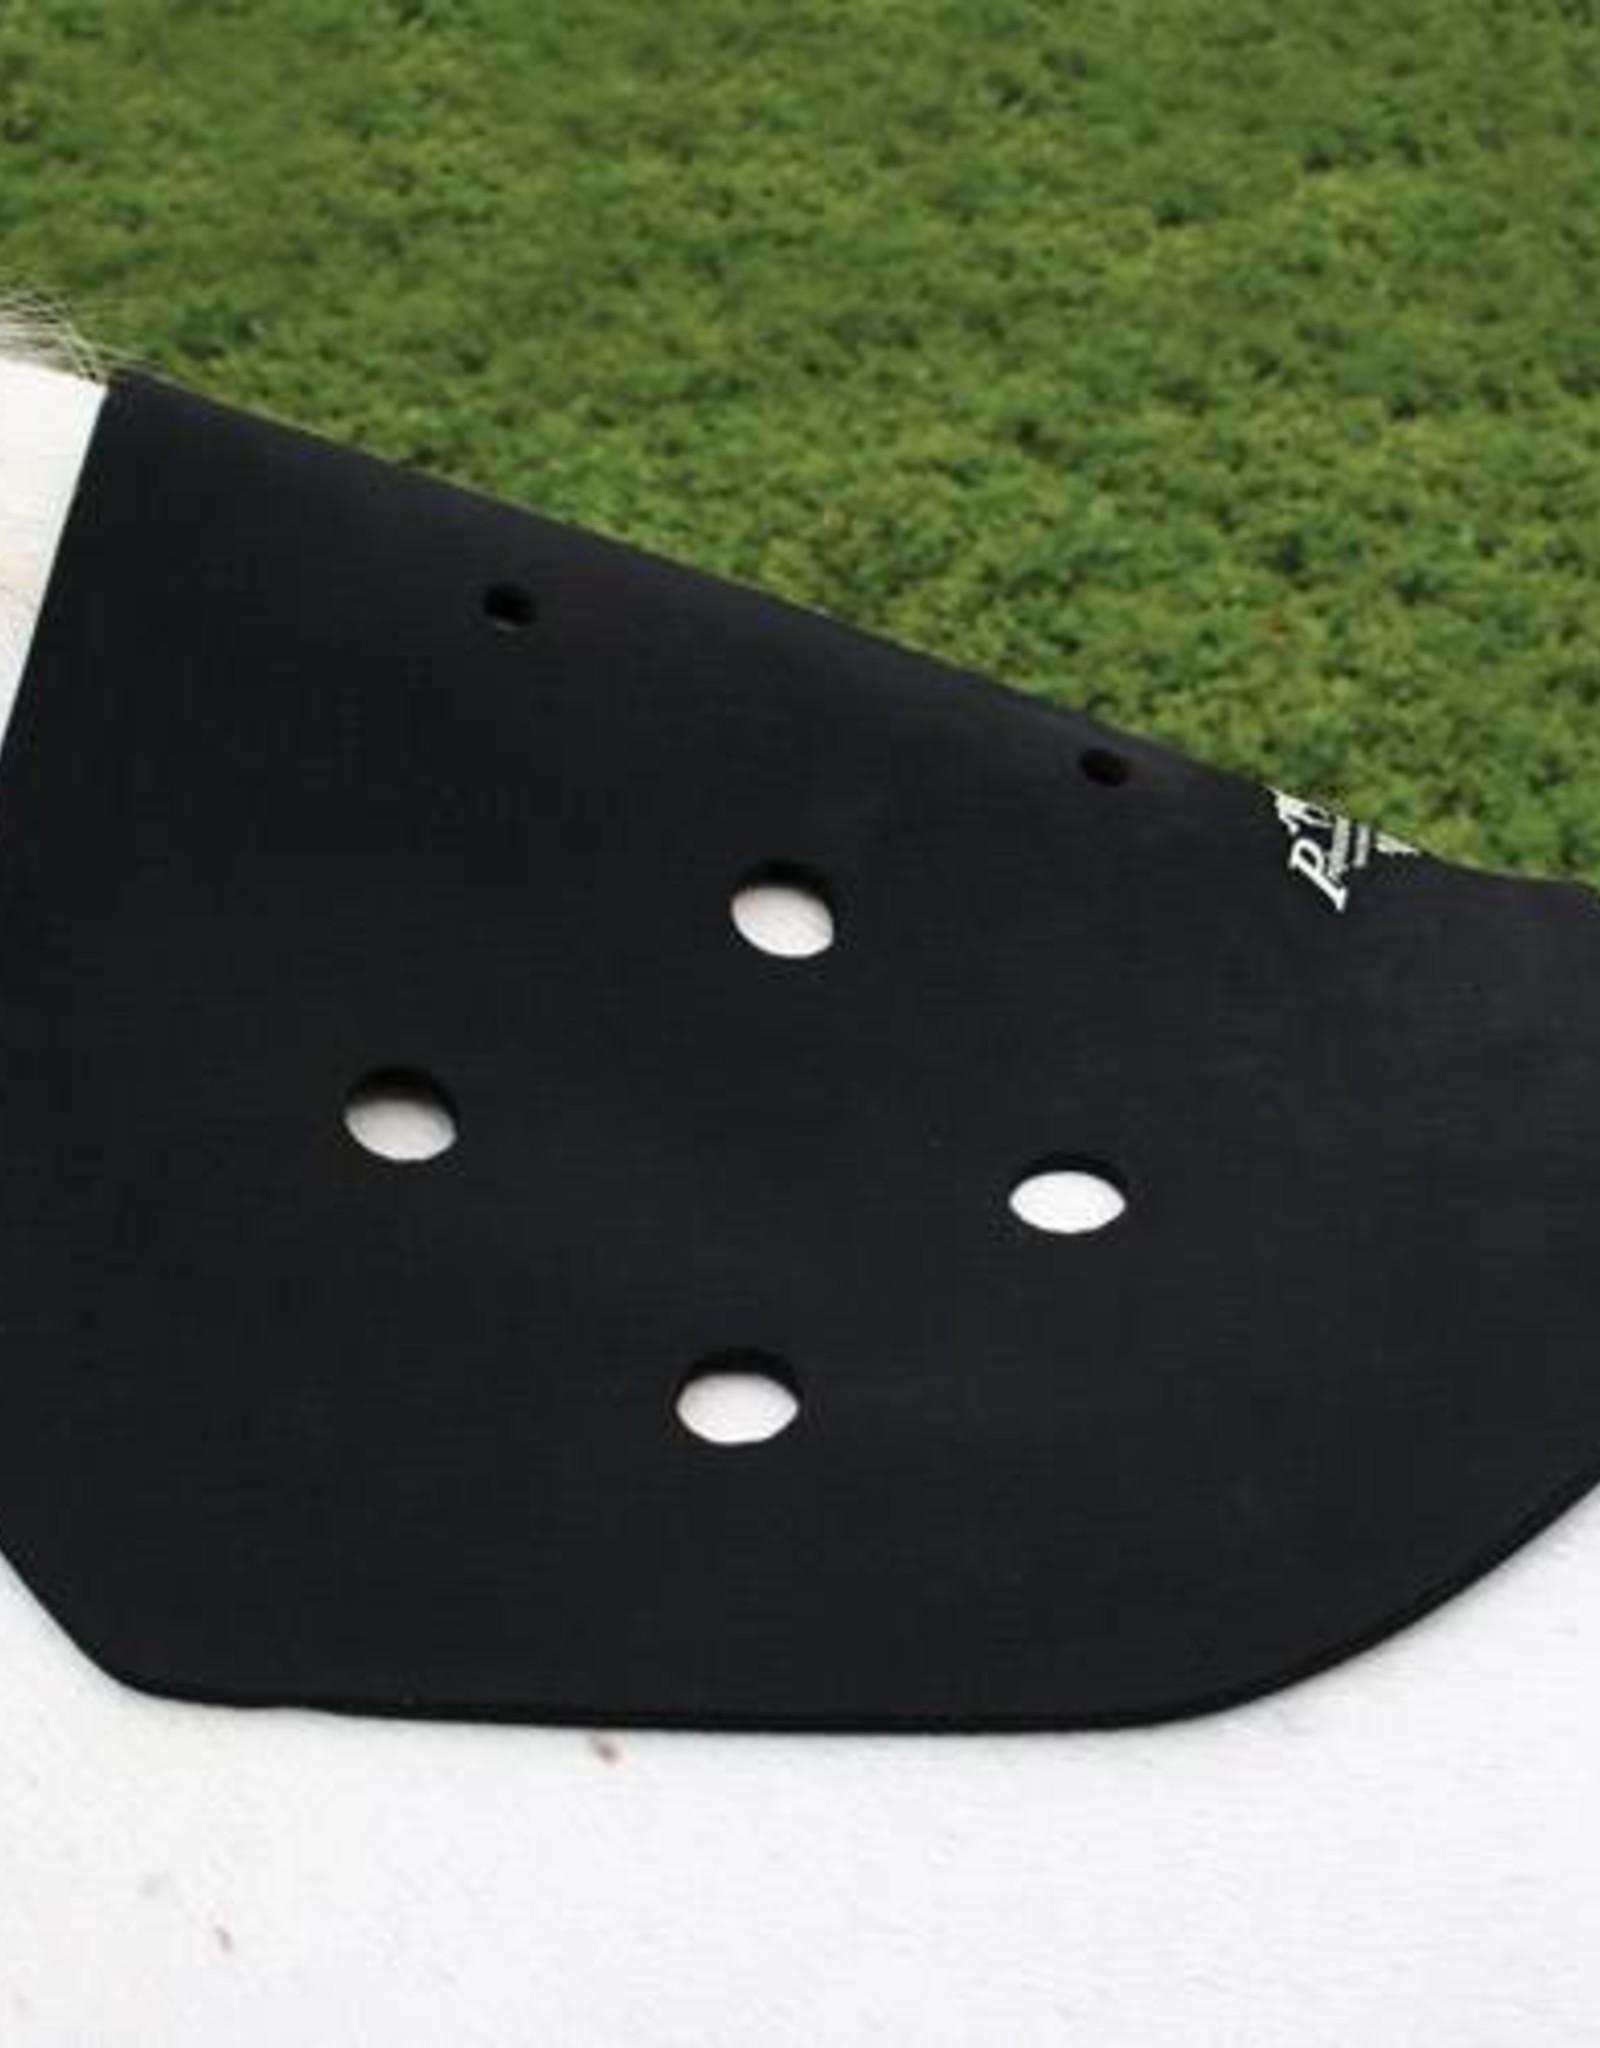 PROFESSIONAL'S CHOICE NON-SLIP PAD BLACK -ONE SIZE